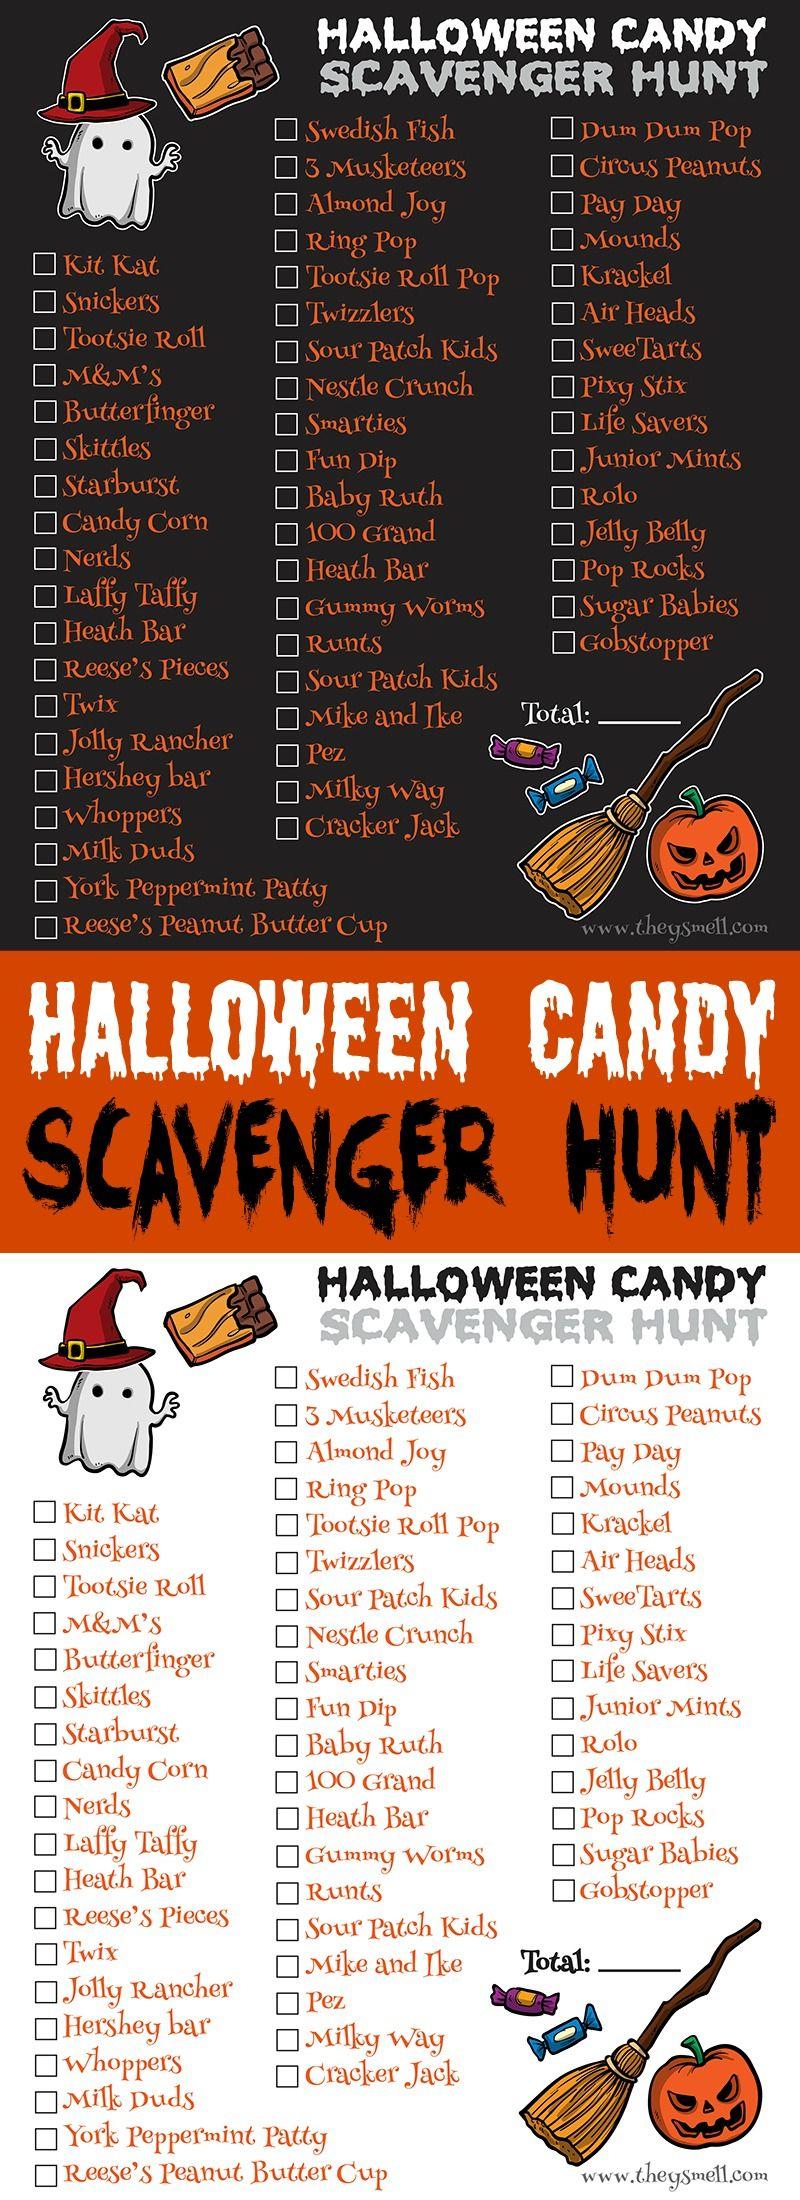 Halloween Candy Scavenger Hunt Printable Halloween